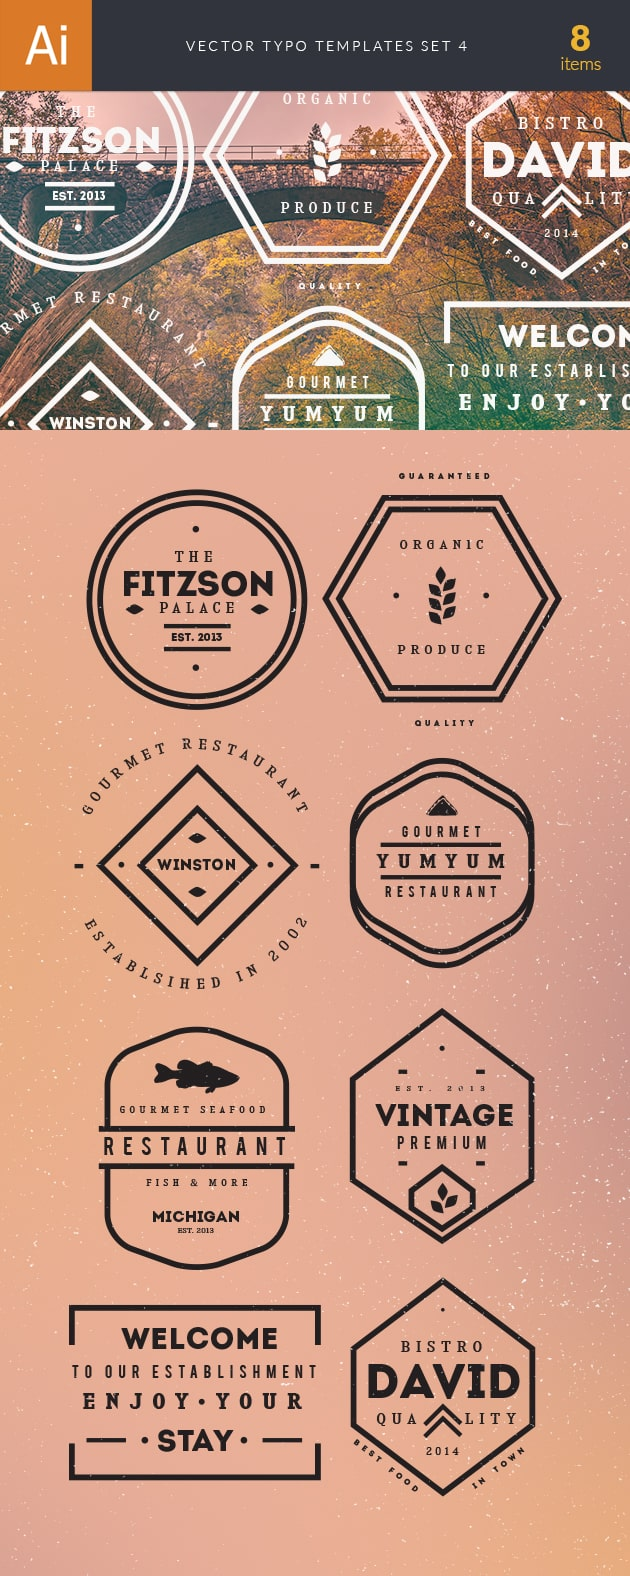 Vector Typography Templates Set 4 2